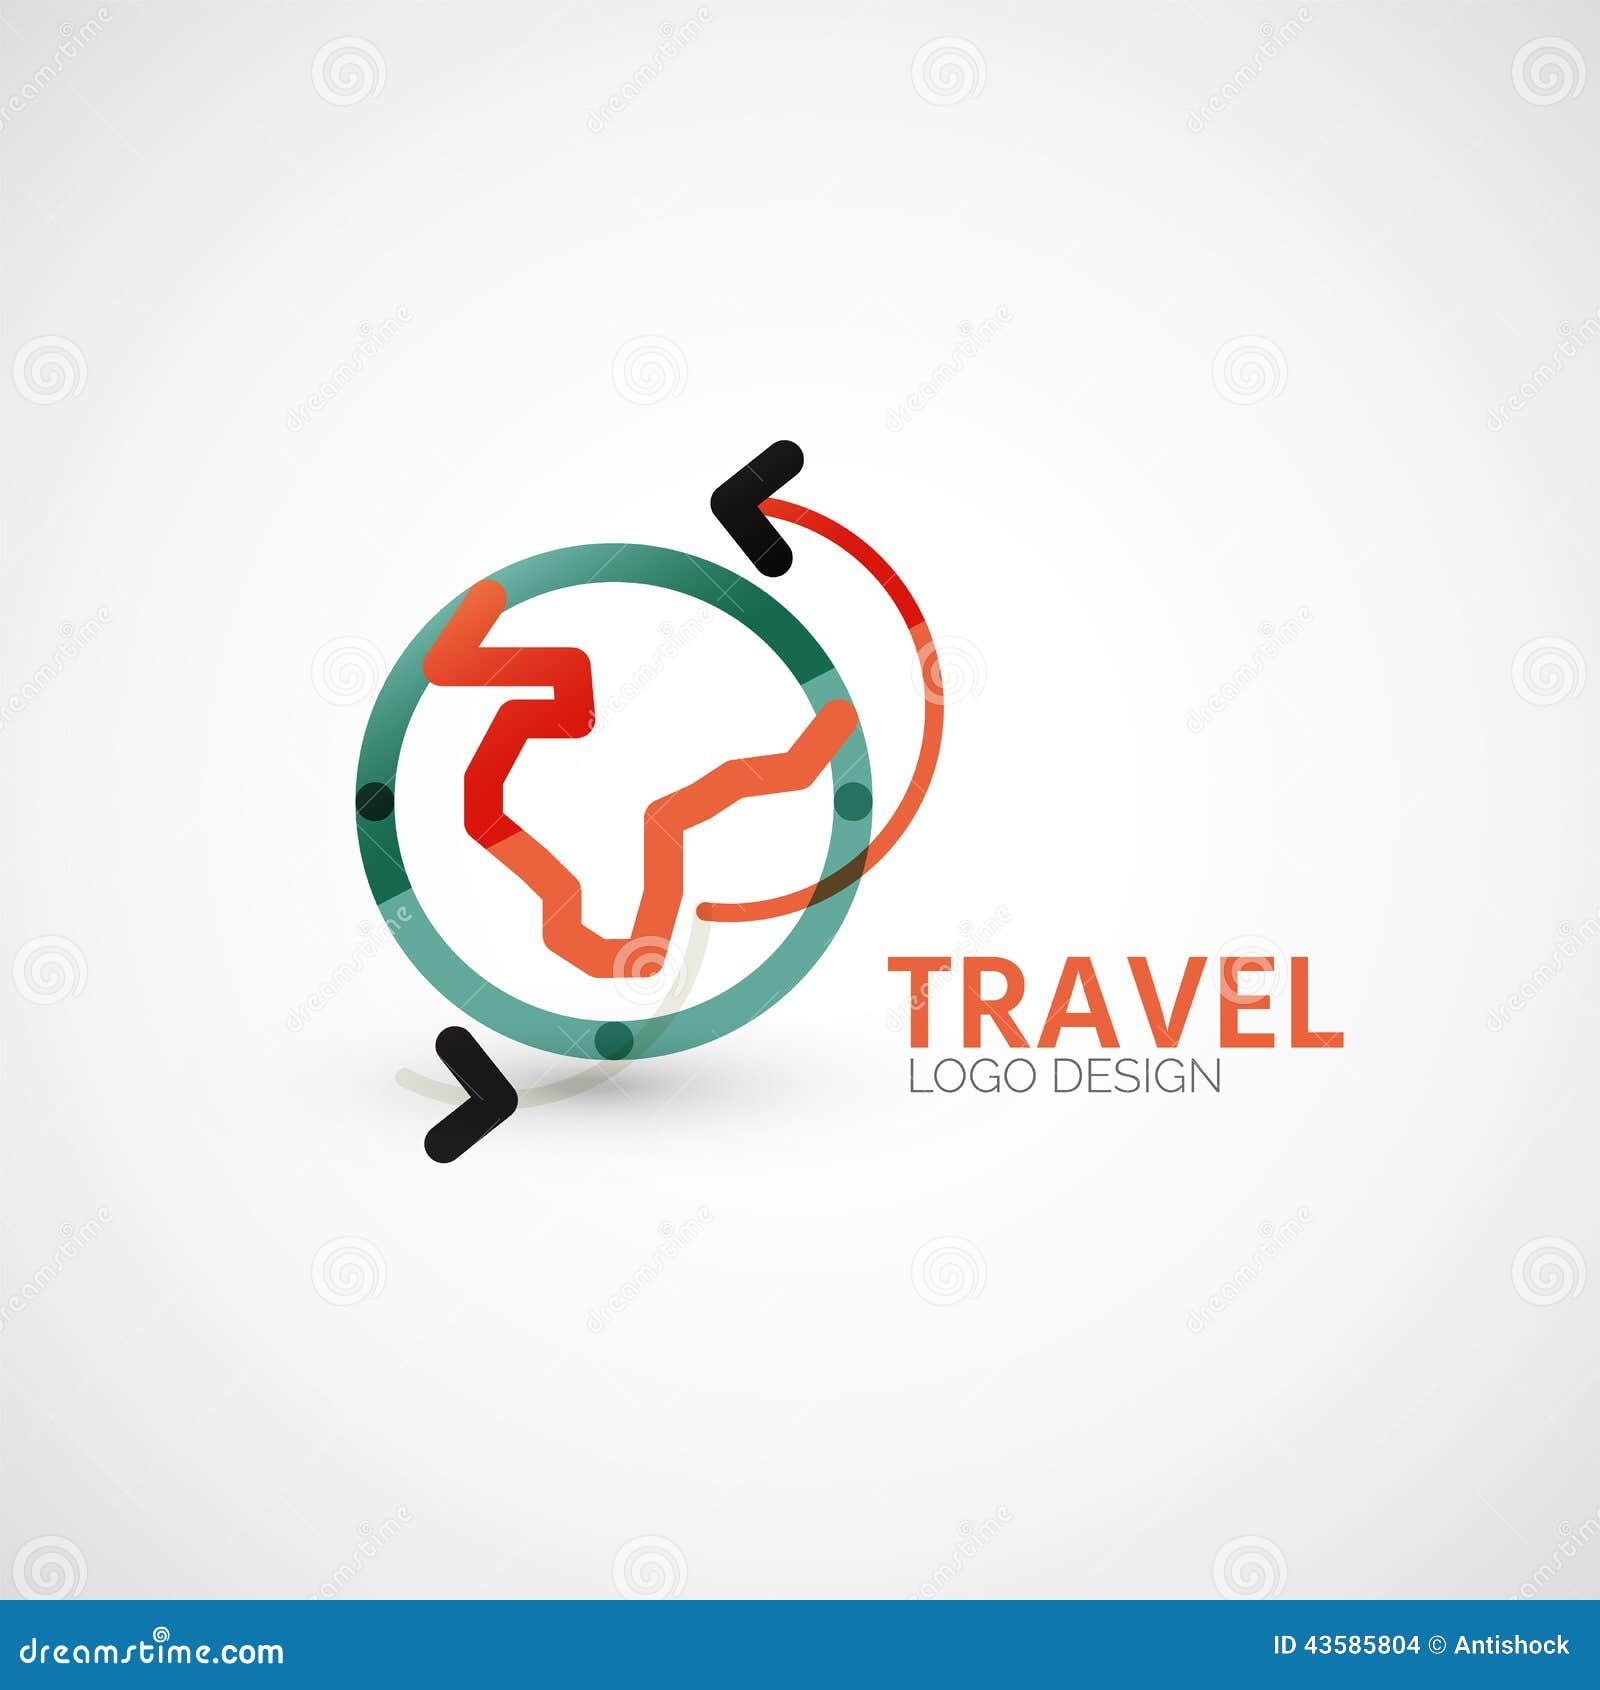 Travel Tour Agency Sample Business Plan